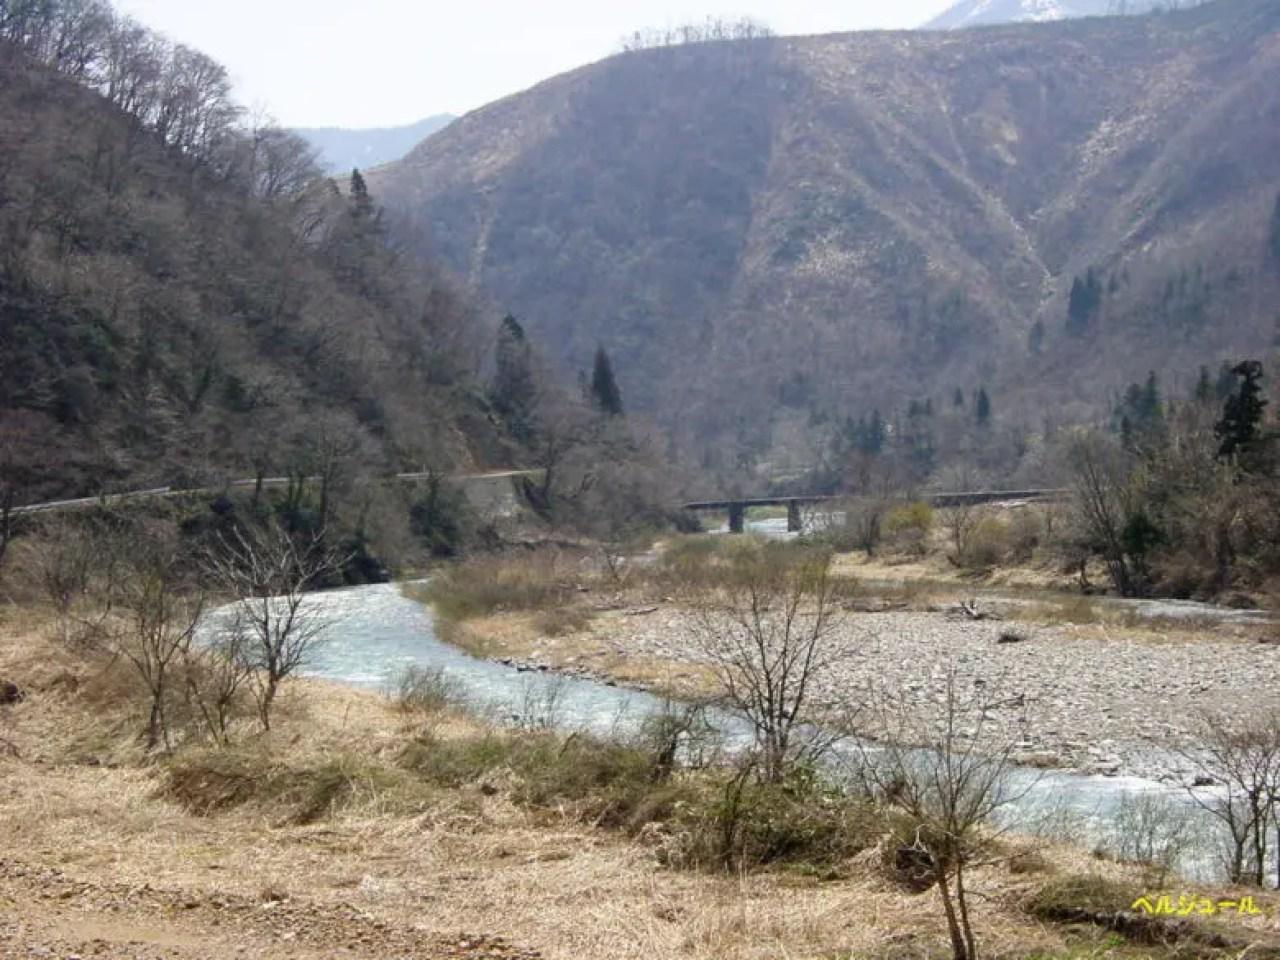 tokuyama00009 - 揖斐川上流・旧徳山村での岩魚釣り